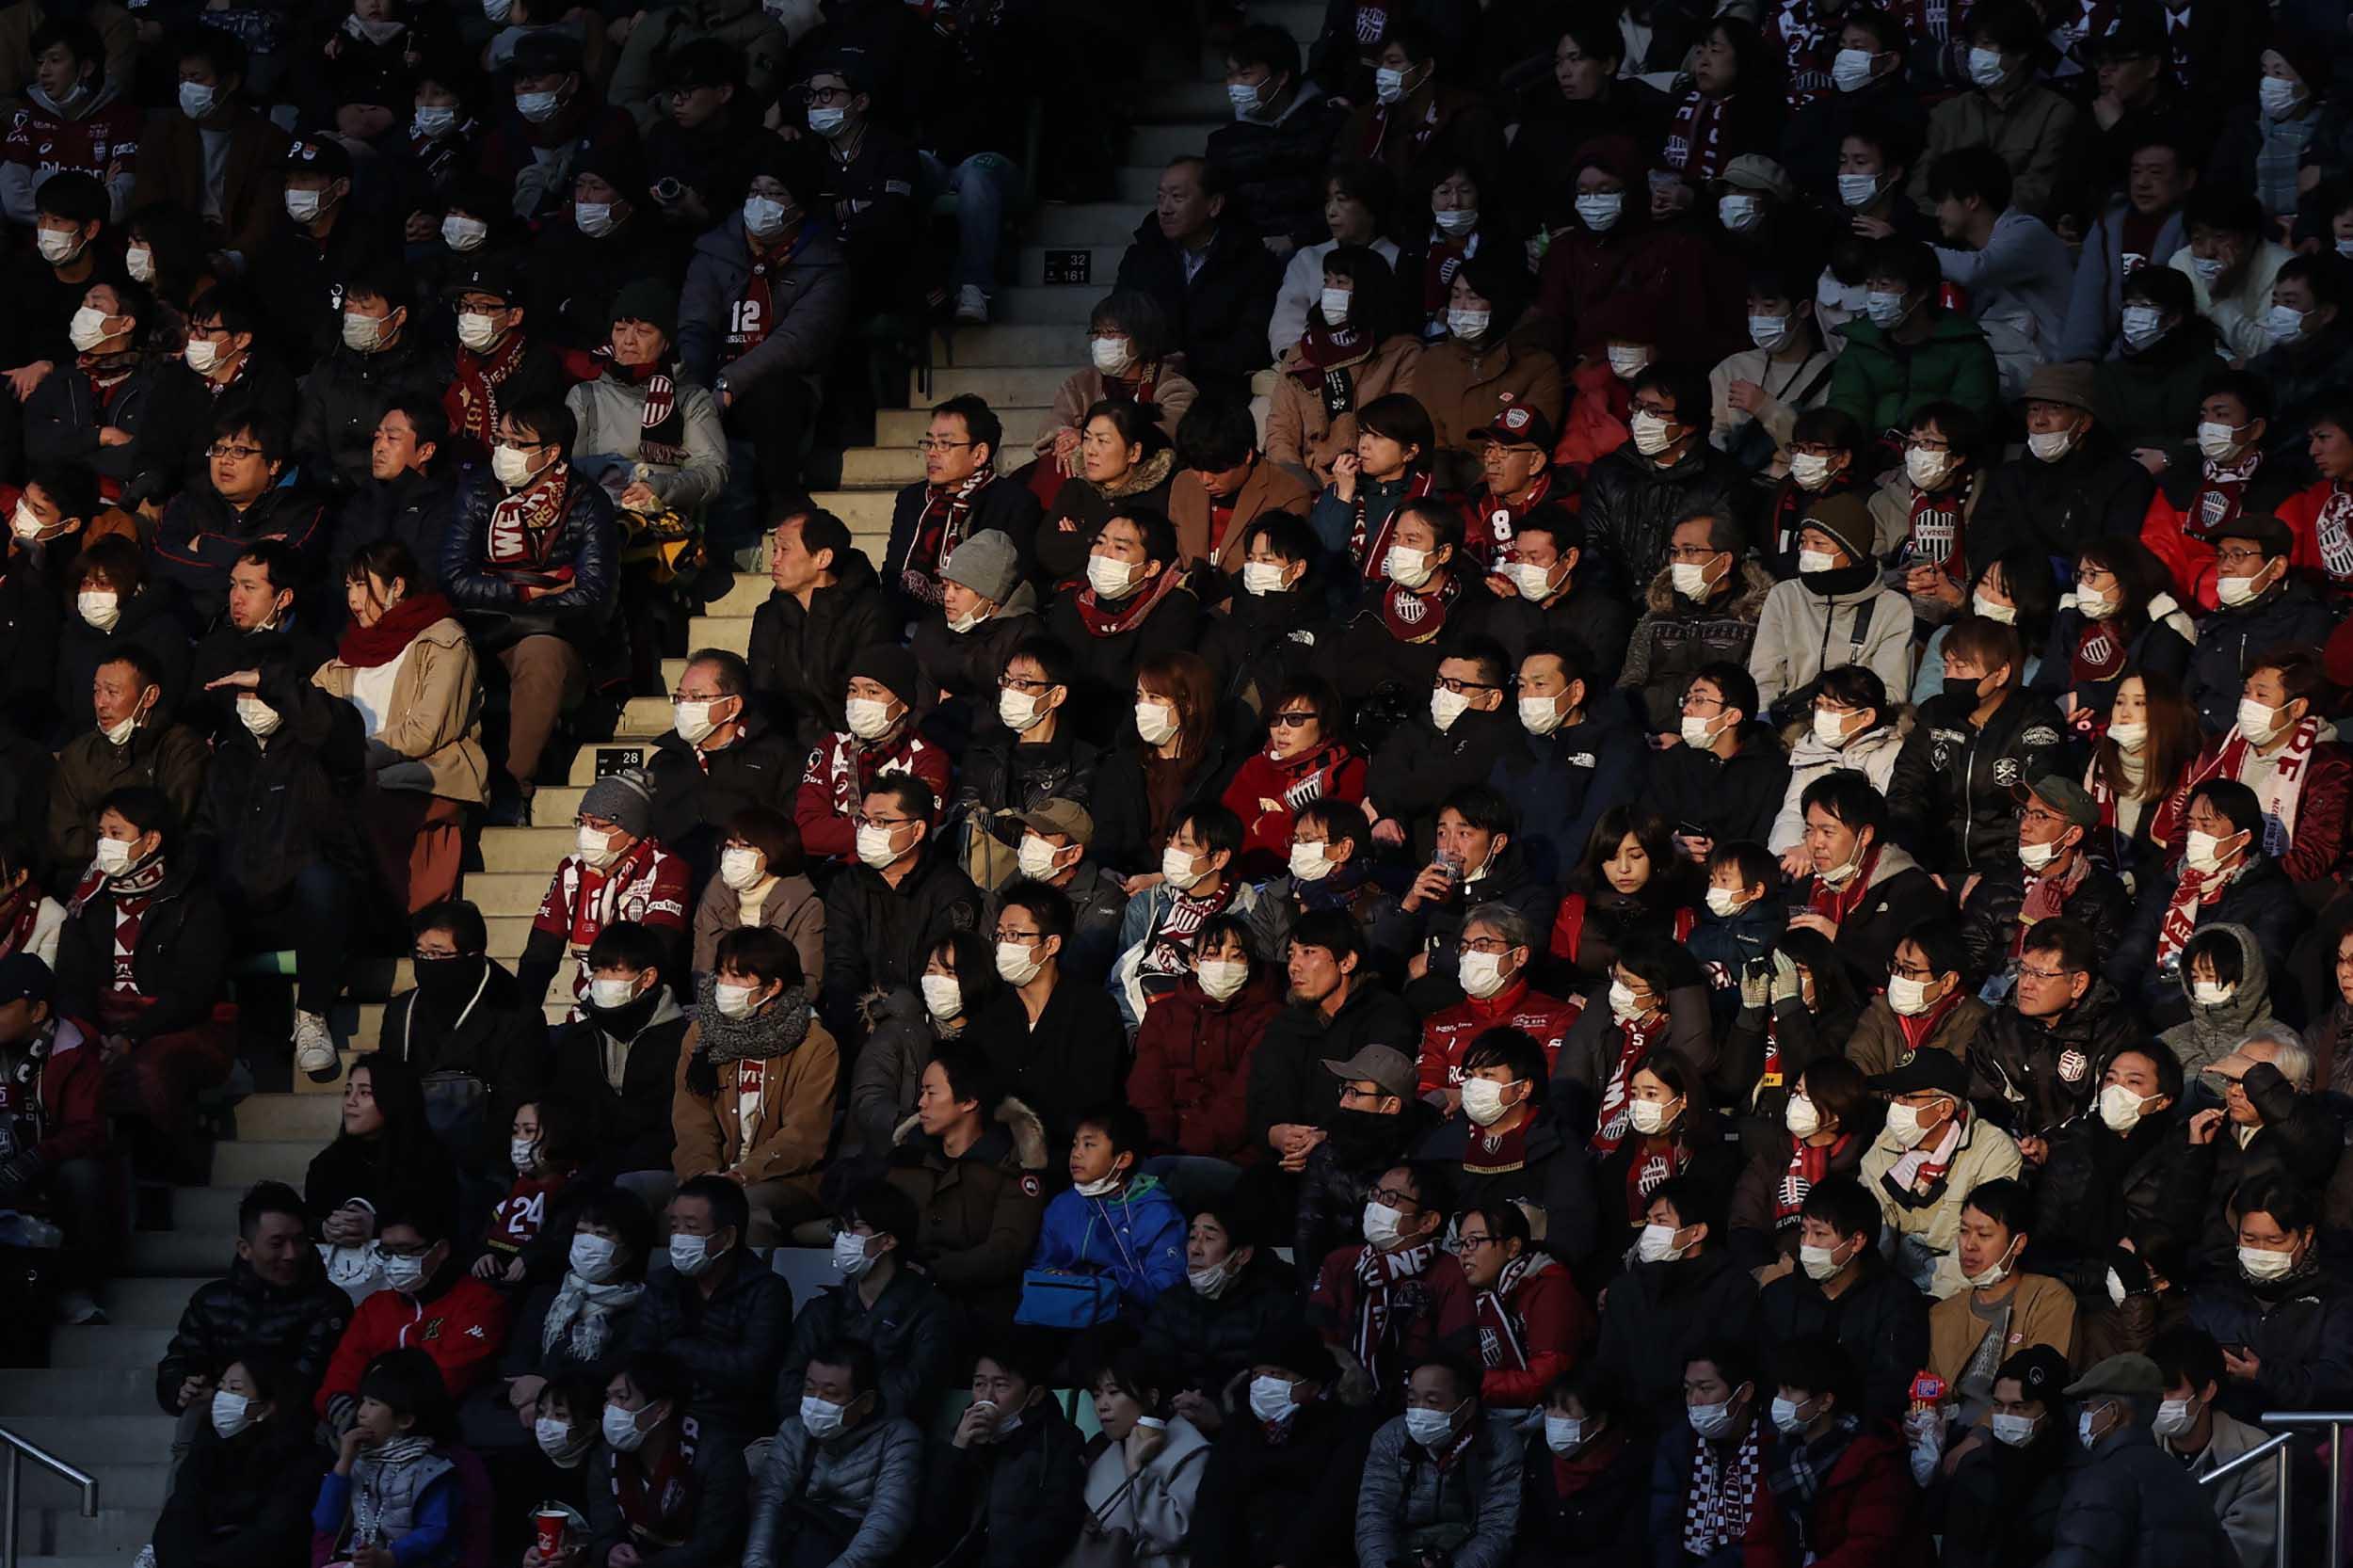 Spectators wearing face masks watch a J League soccer game in Kobe, Japan, on Sunday.